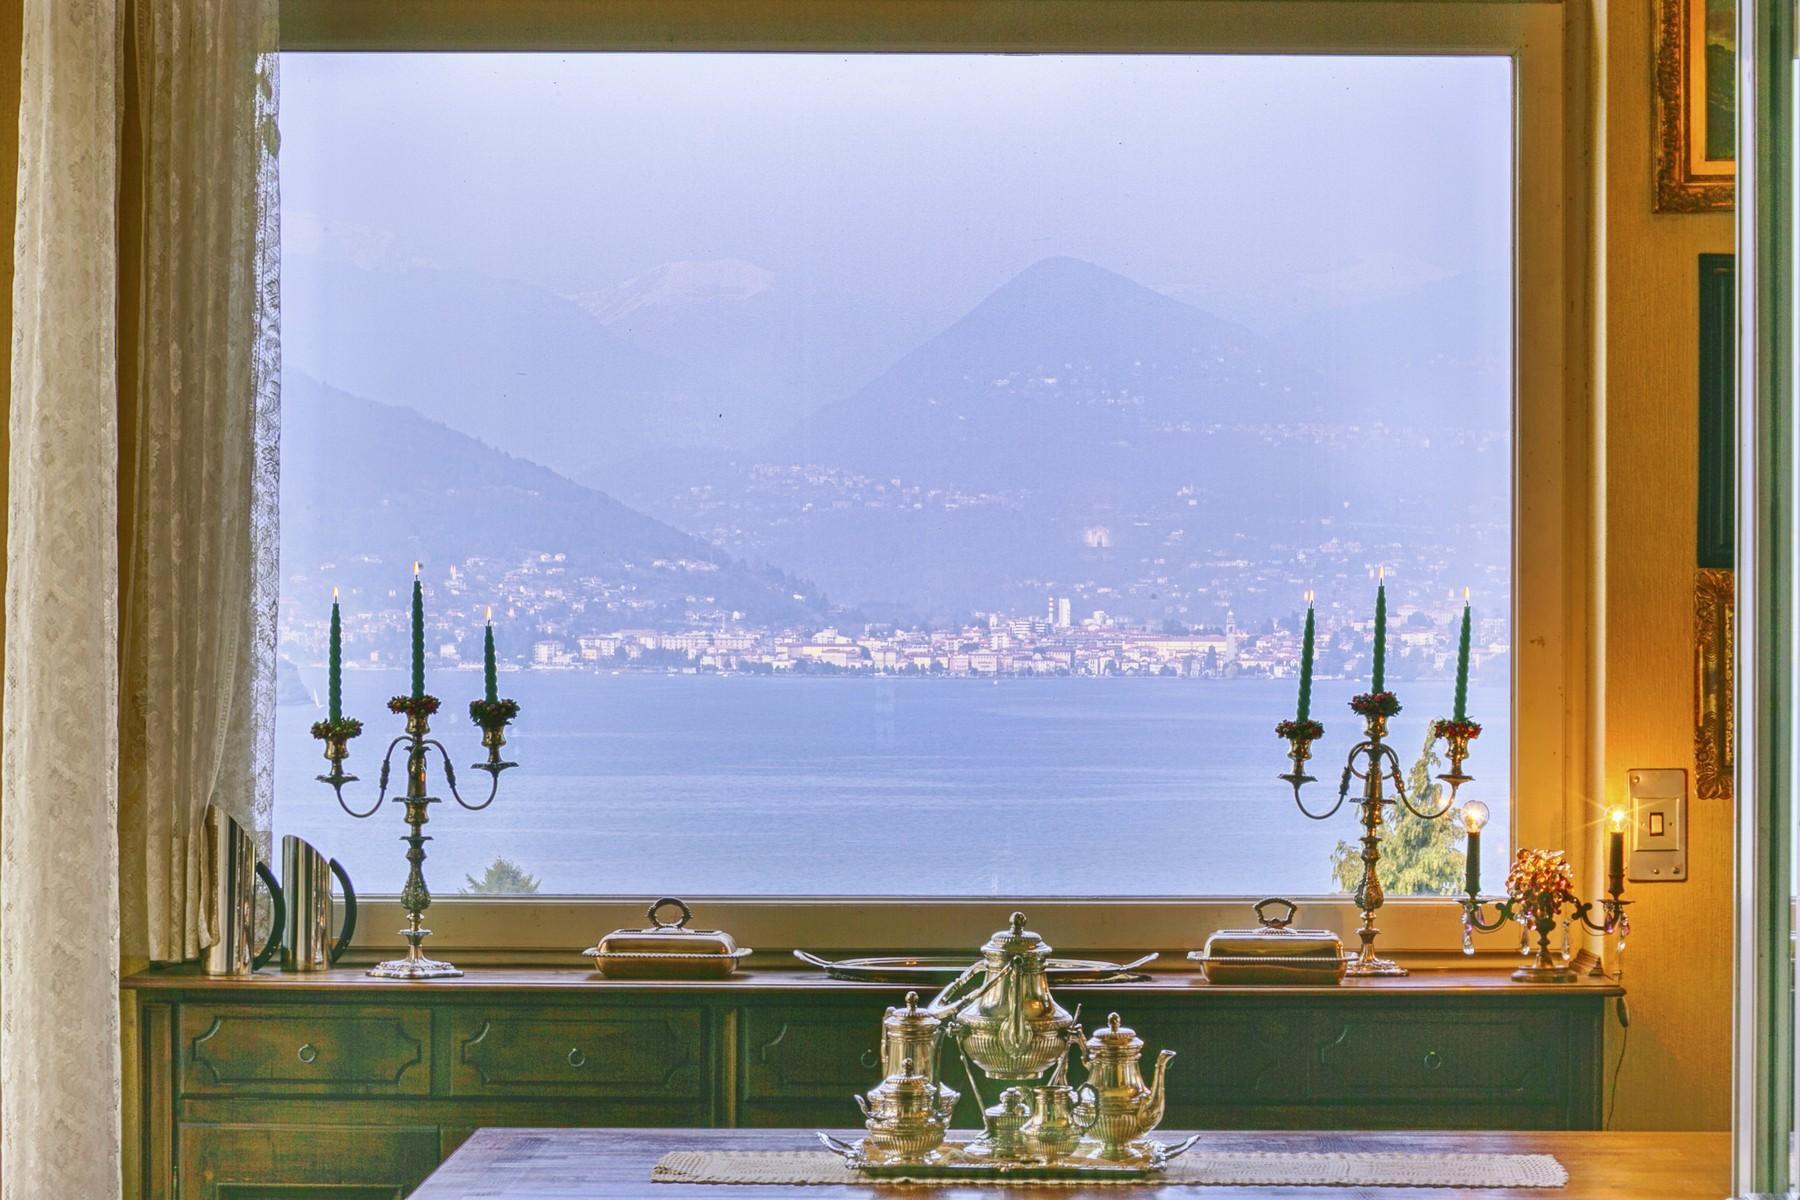 久负盛名的别墅享有Lago Maggiore湖景风光 - 3